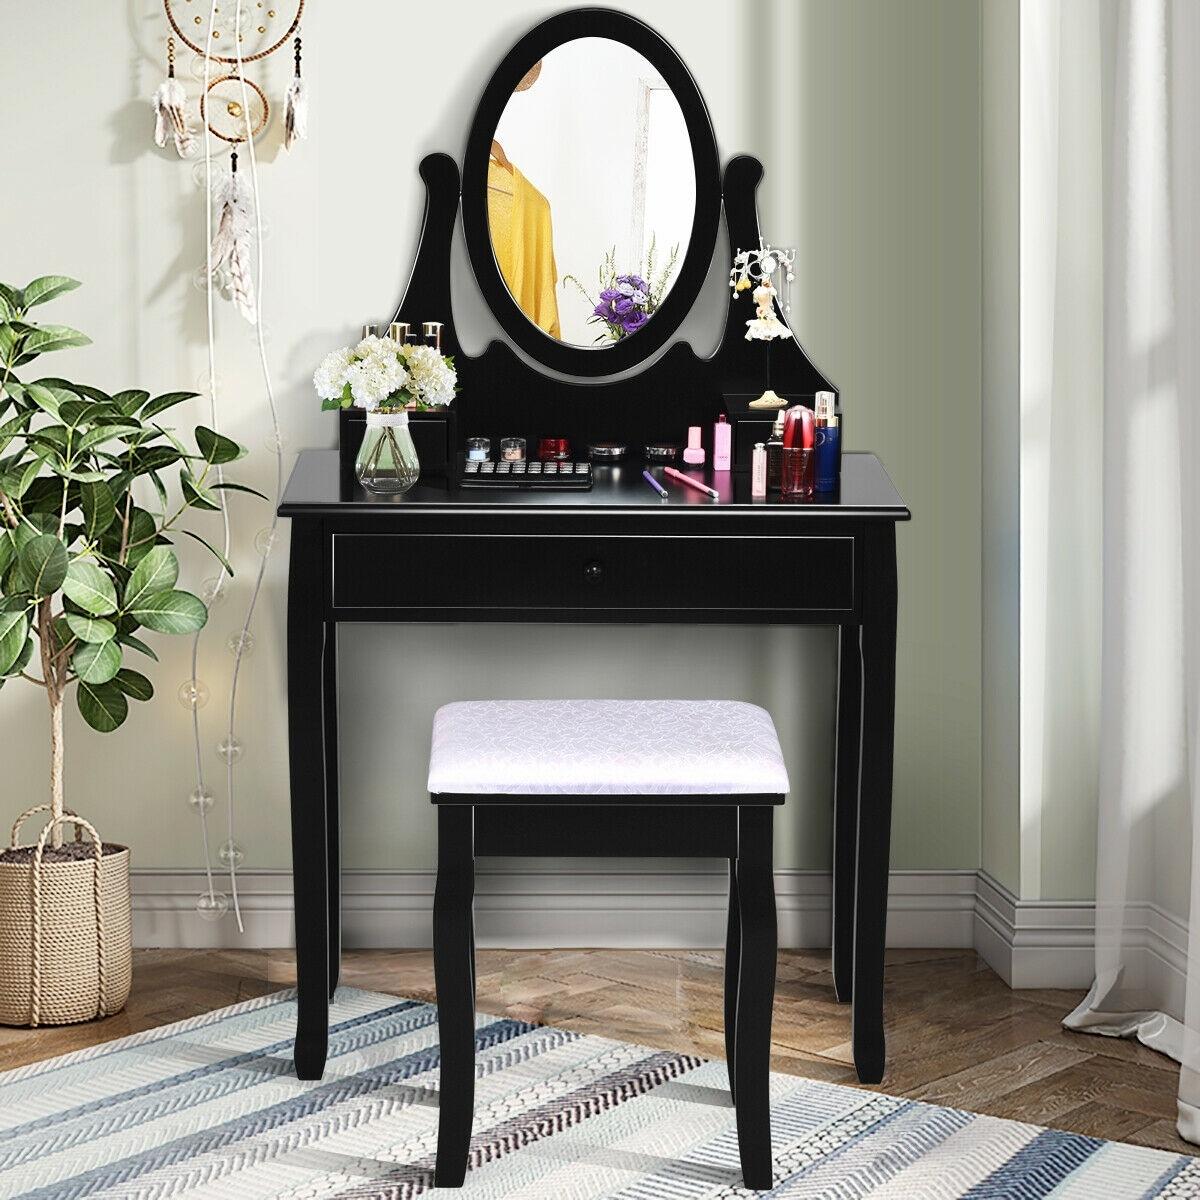 Shop Gymax Bedroom Wooden Mirrored Makeup Vanity Set W Stool Black